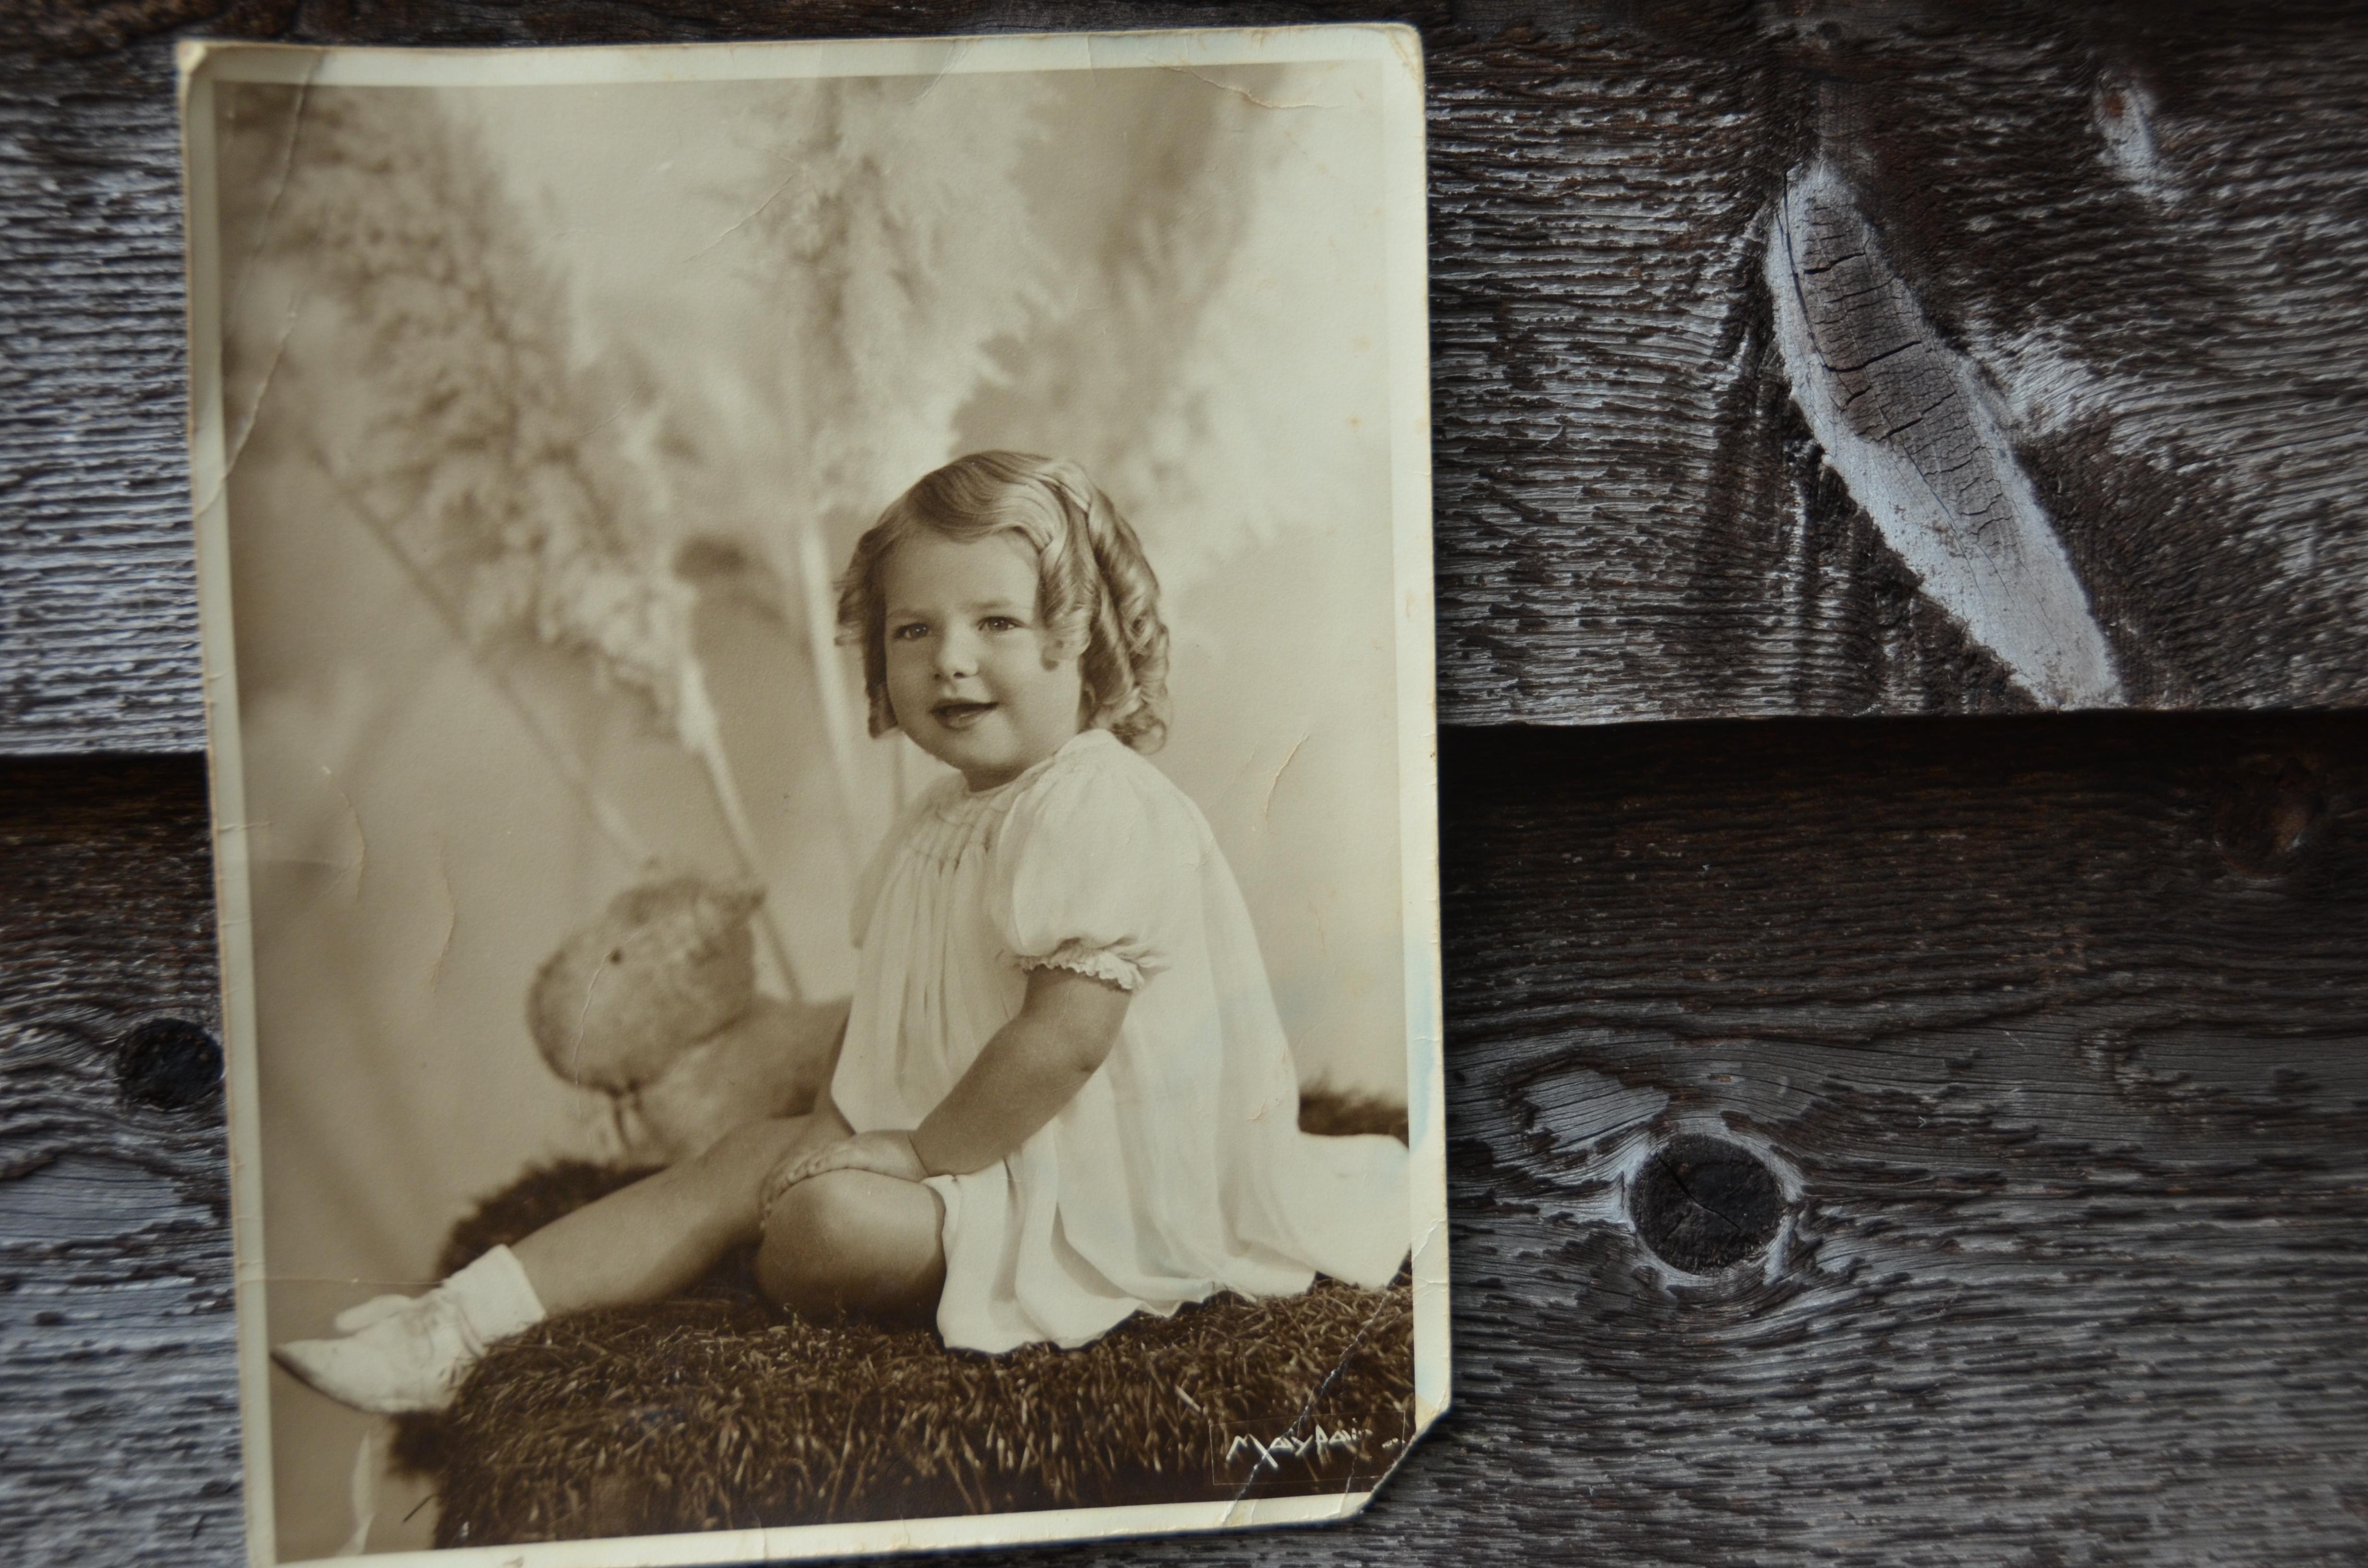 Faithful and True - Beverley's Story